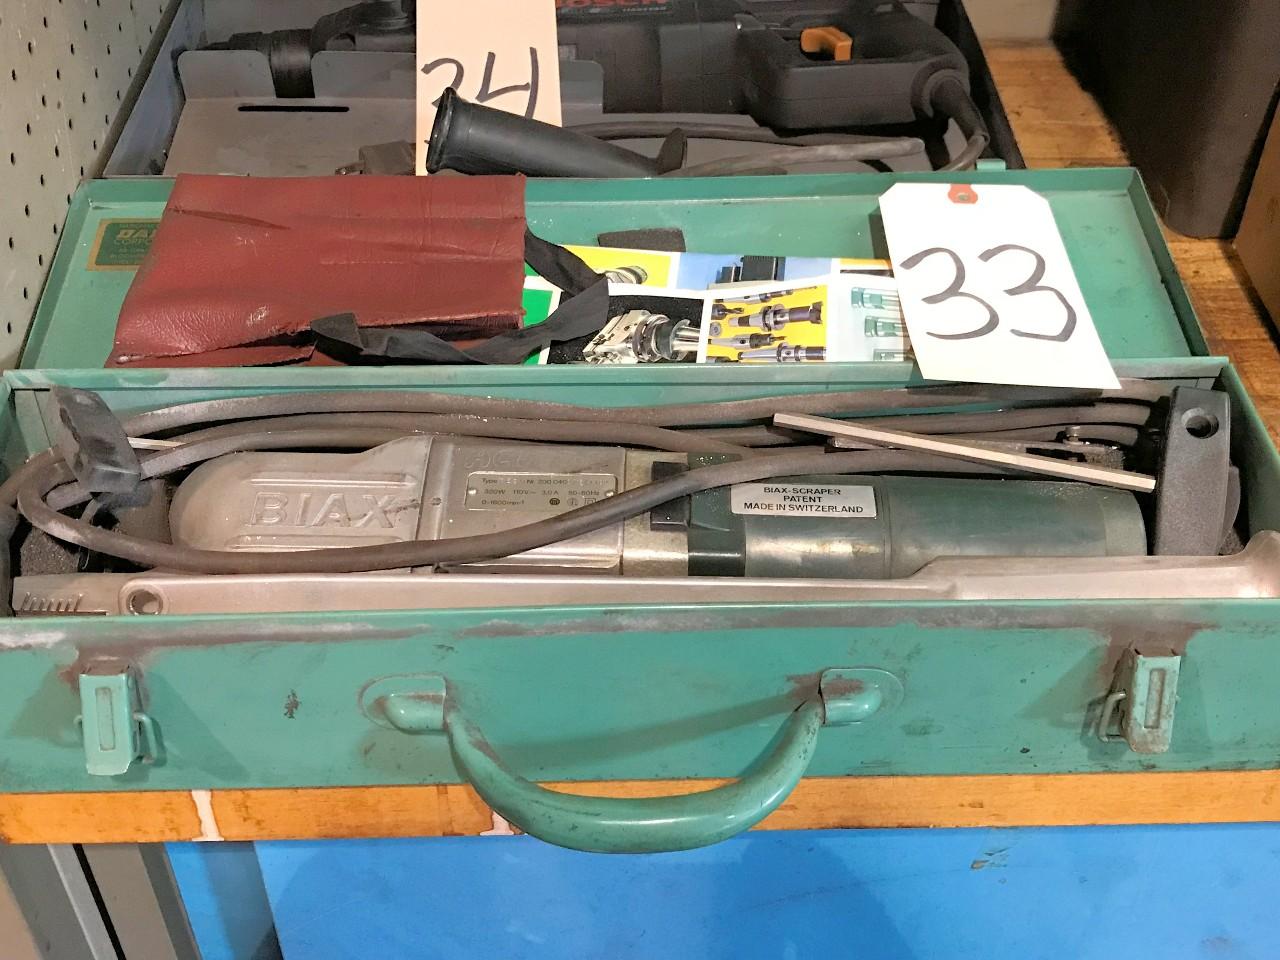 Biax Type 7ESM, No  200 0400 15/1190, Electric Hand Held Scraper with Case